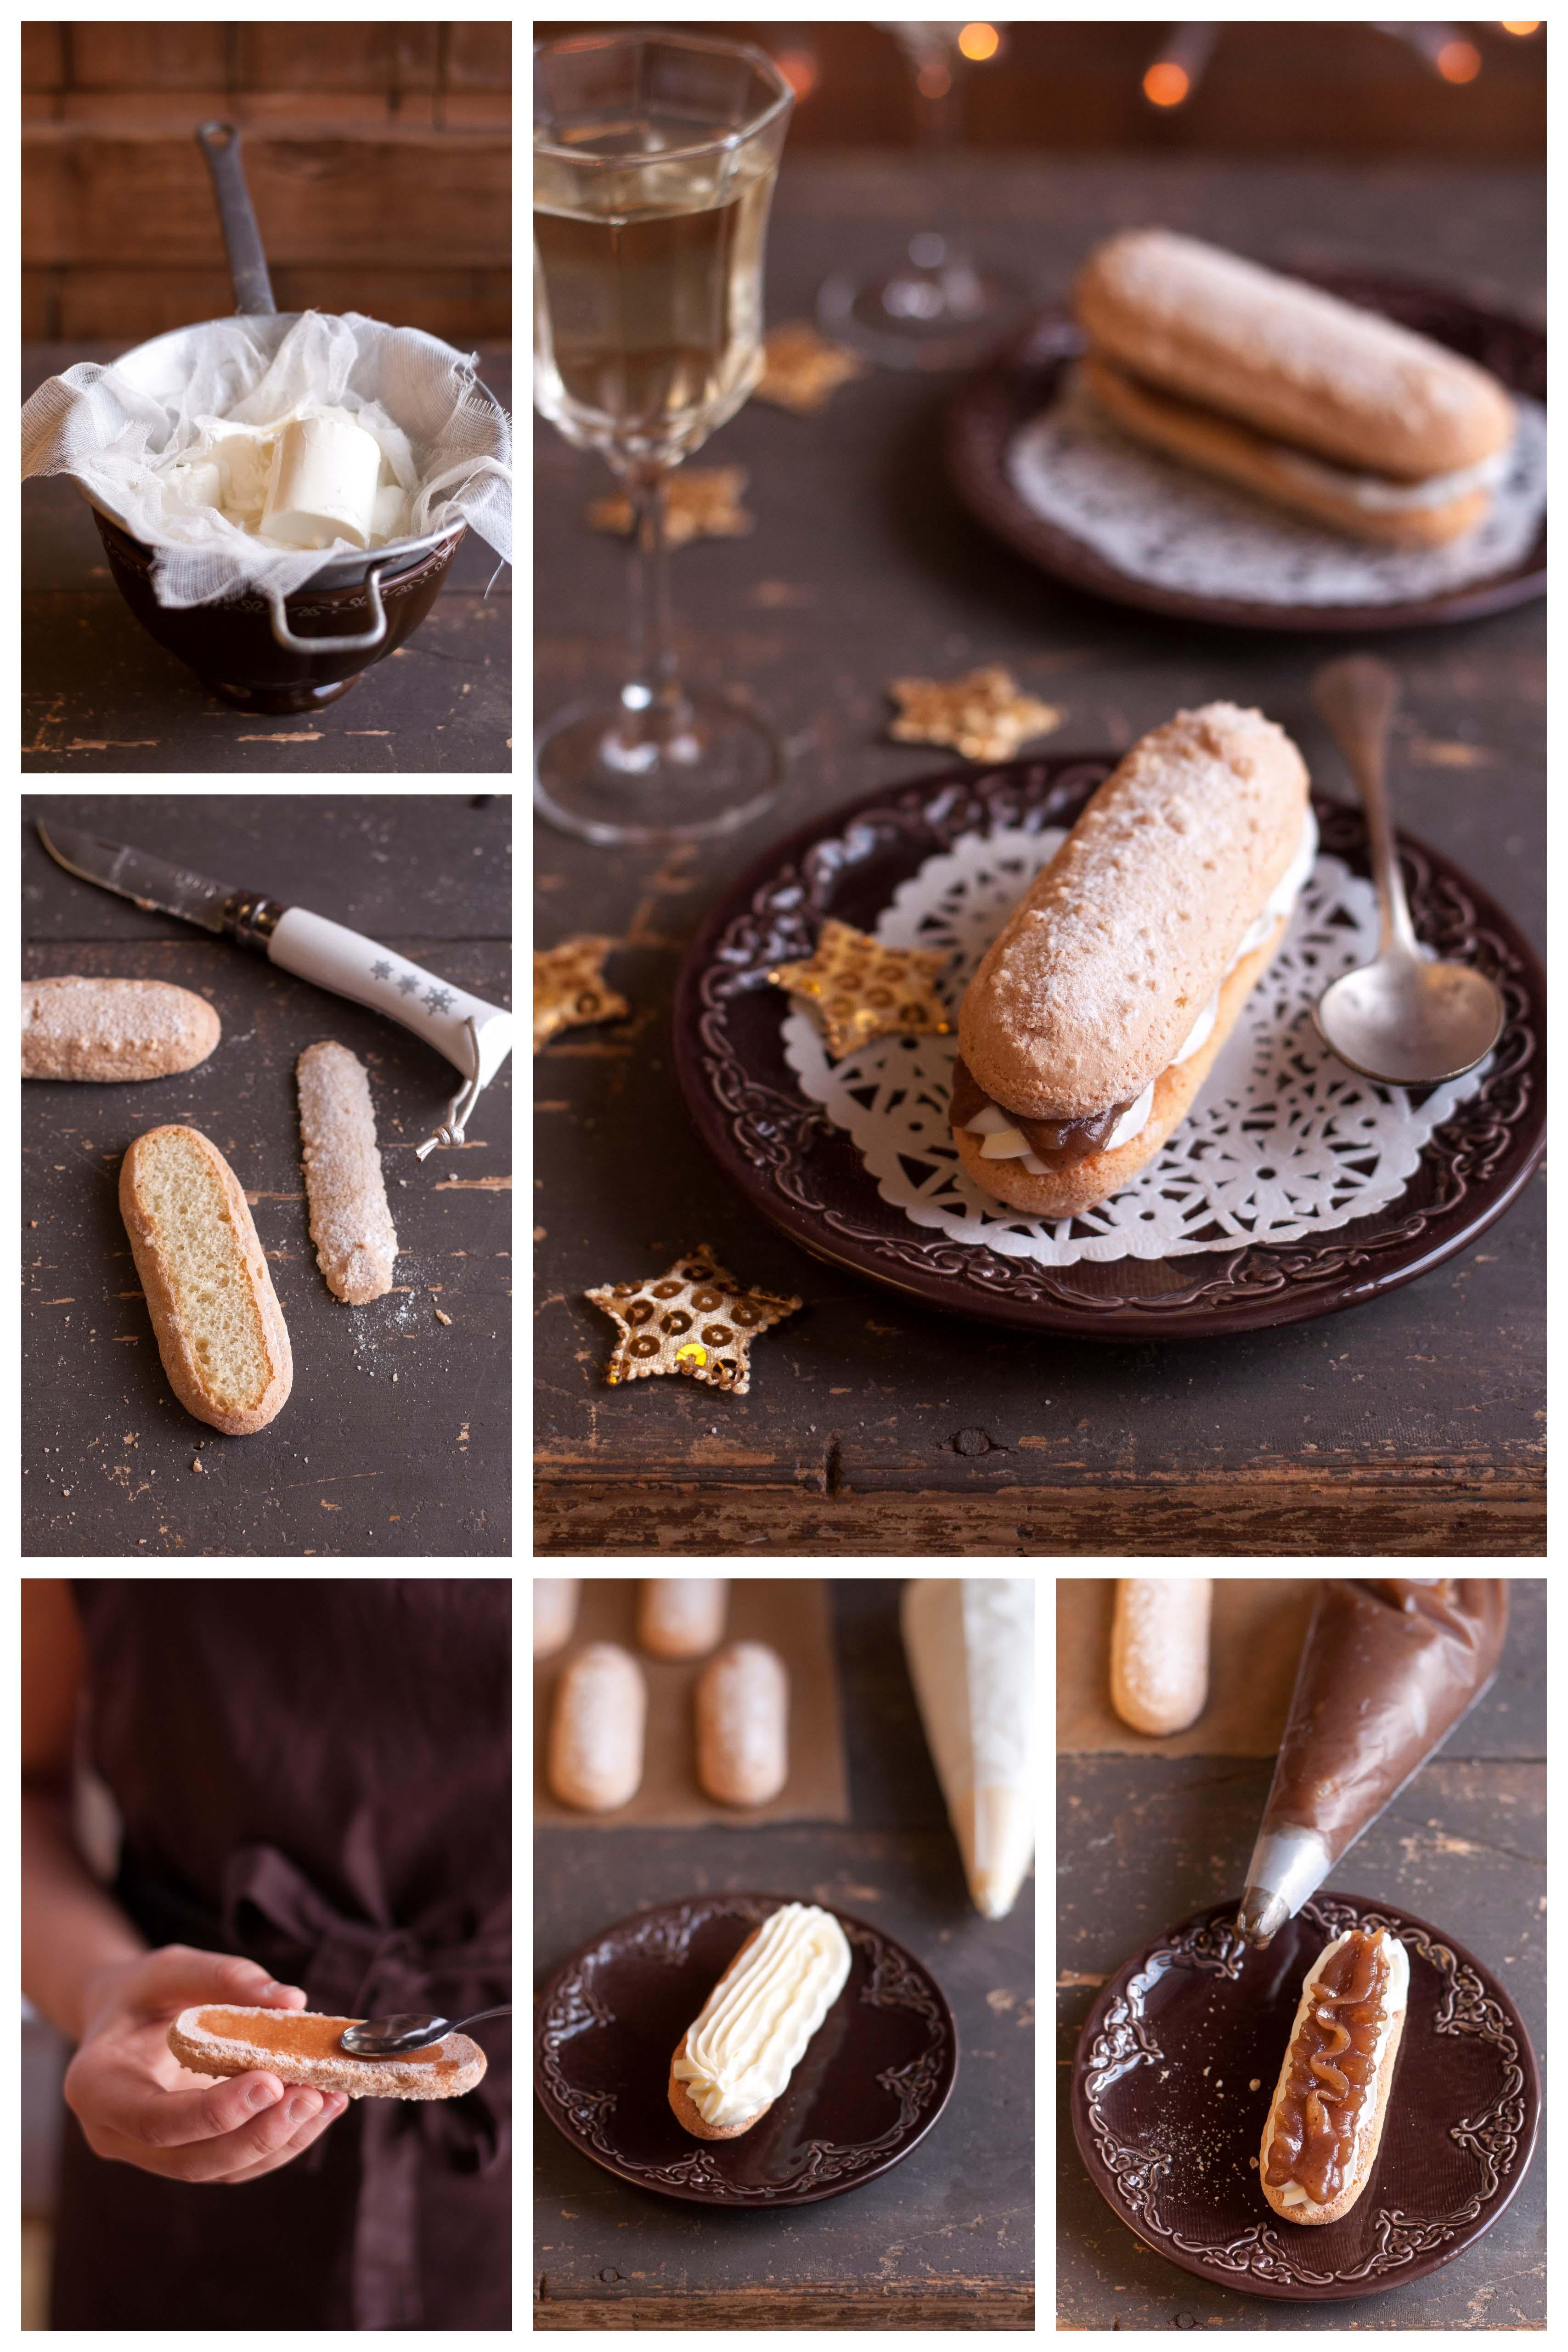 noel-buchettes-mont-blanc-1-montage-2